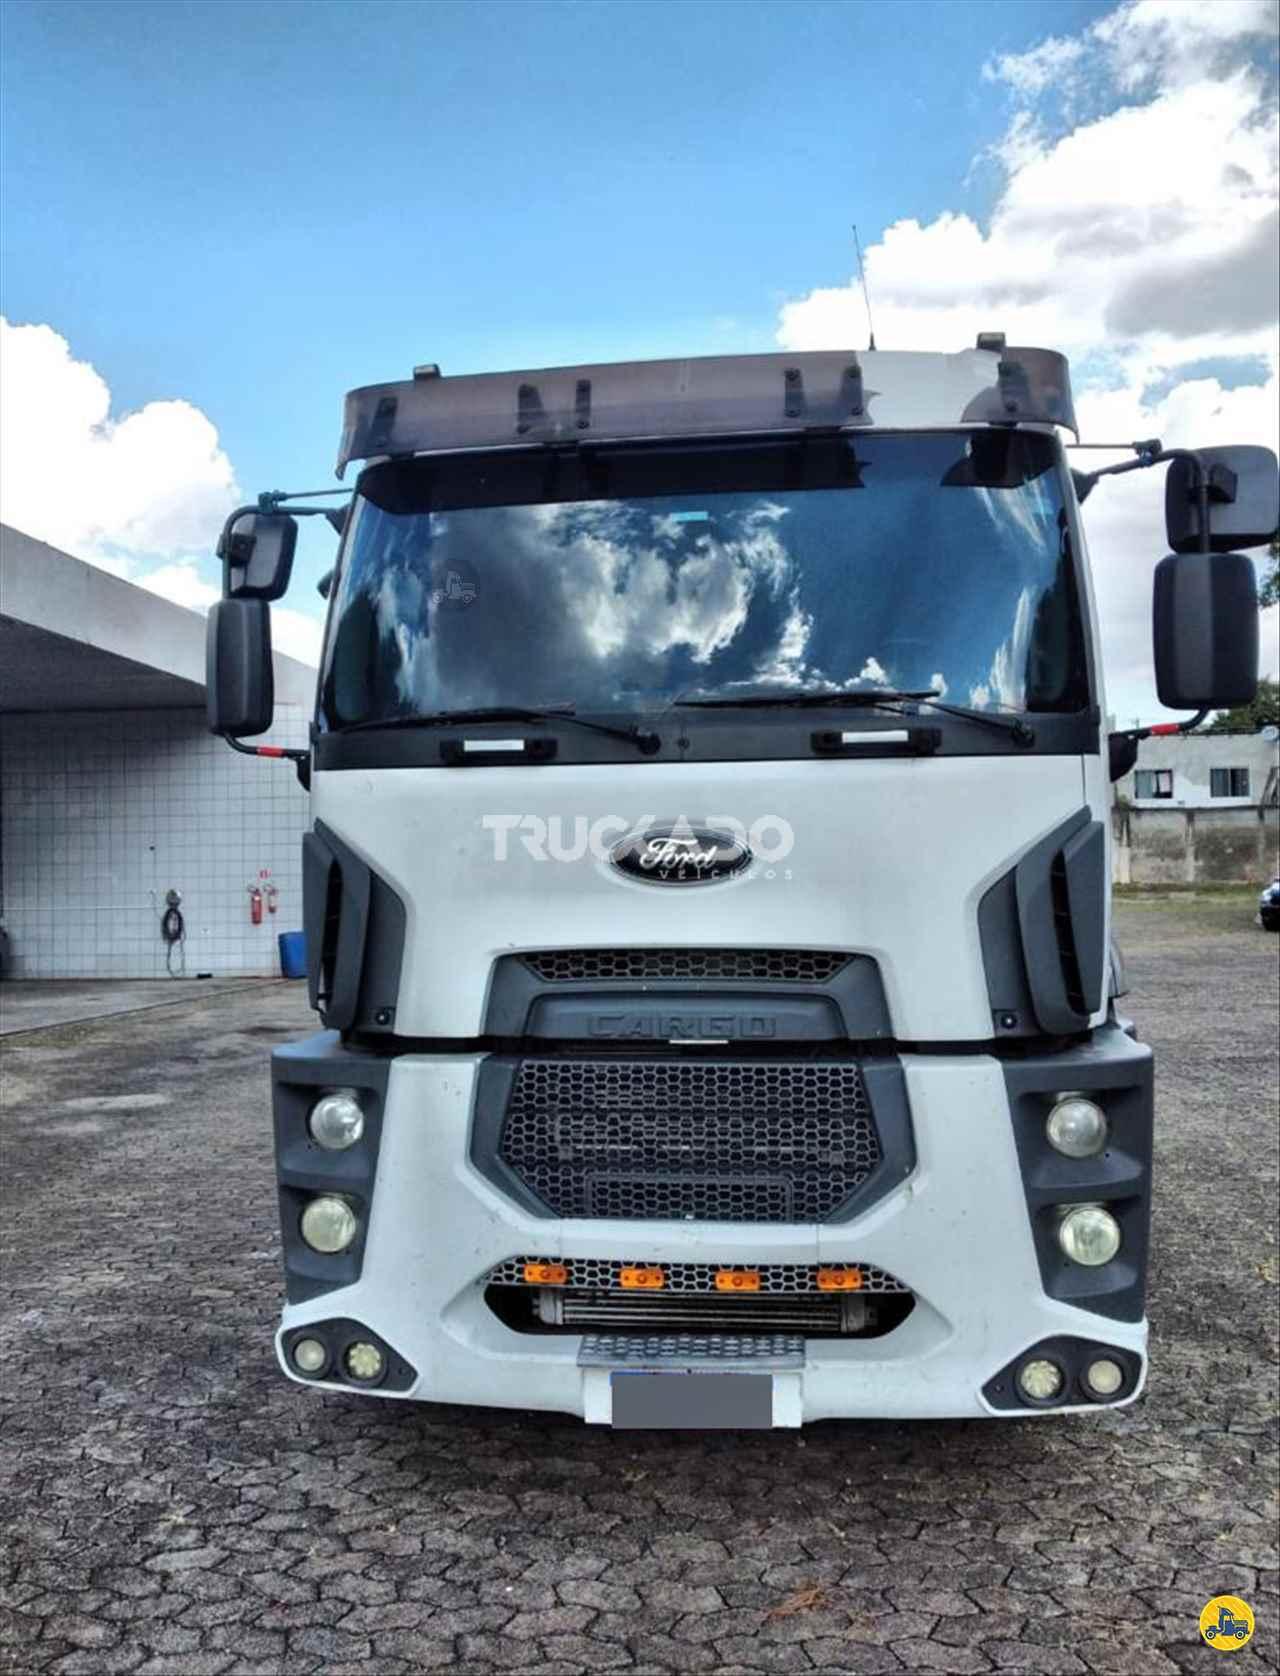 CAMINHAO FORD CARGO 2842 Chassis Truck 6x2 Truckado Veículos SINOP MATO GROSSO MT